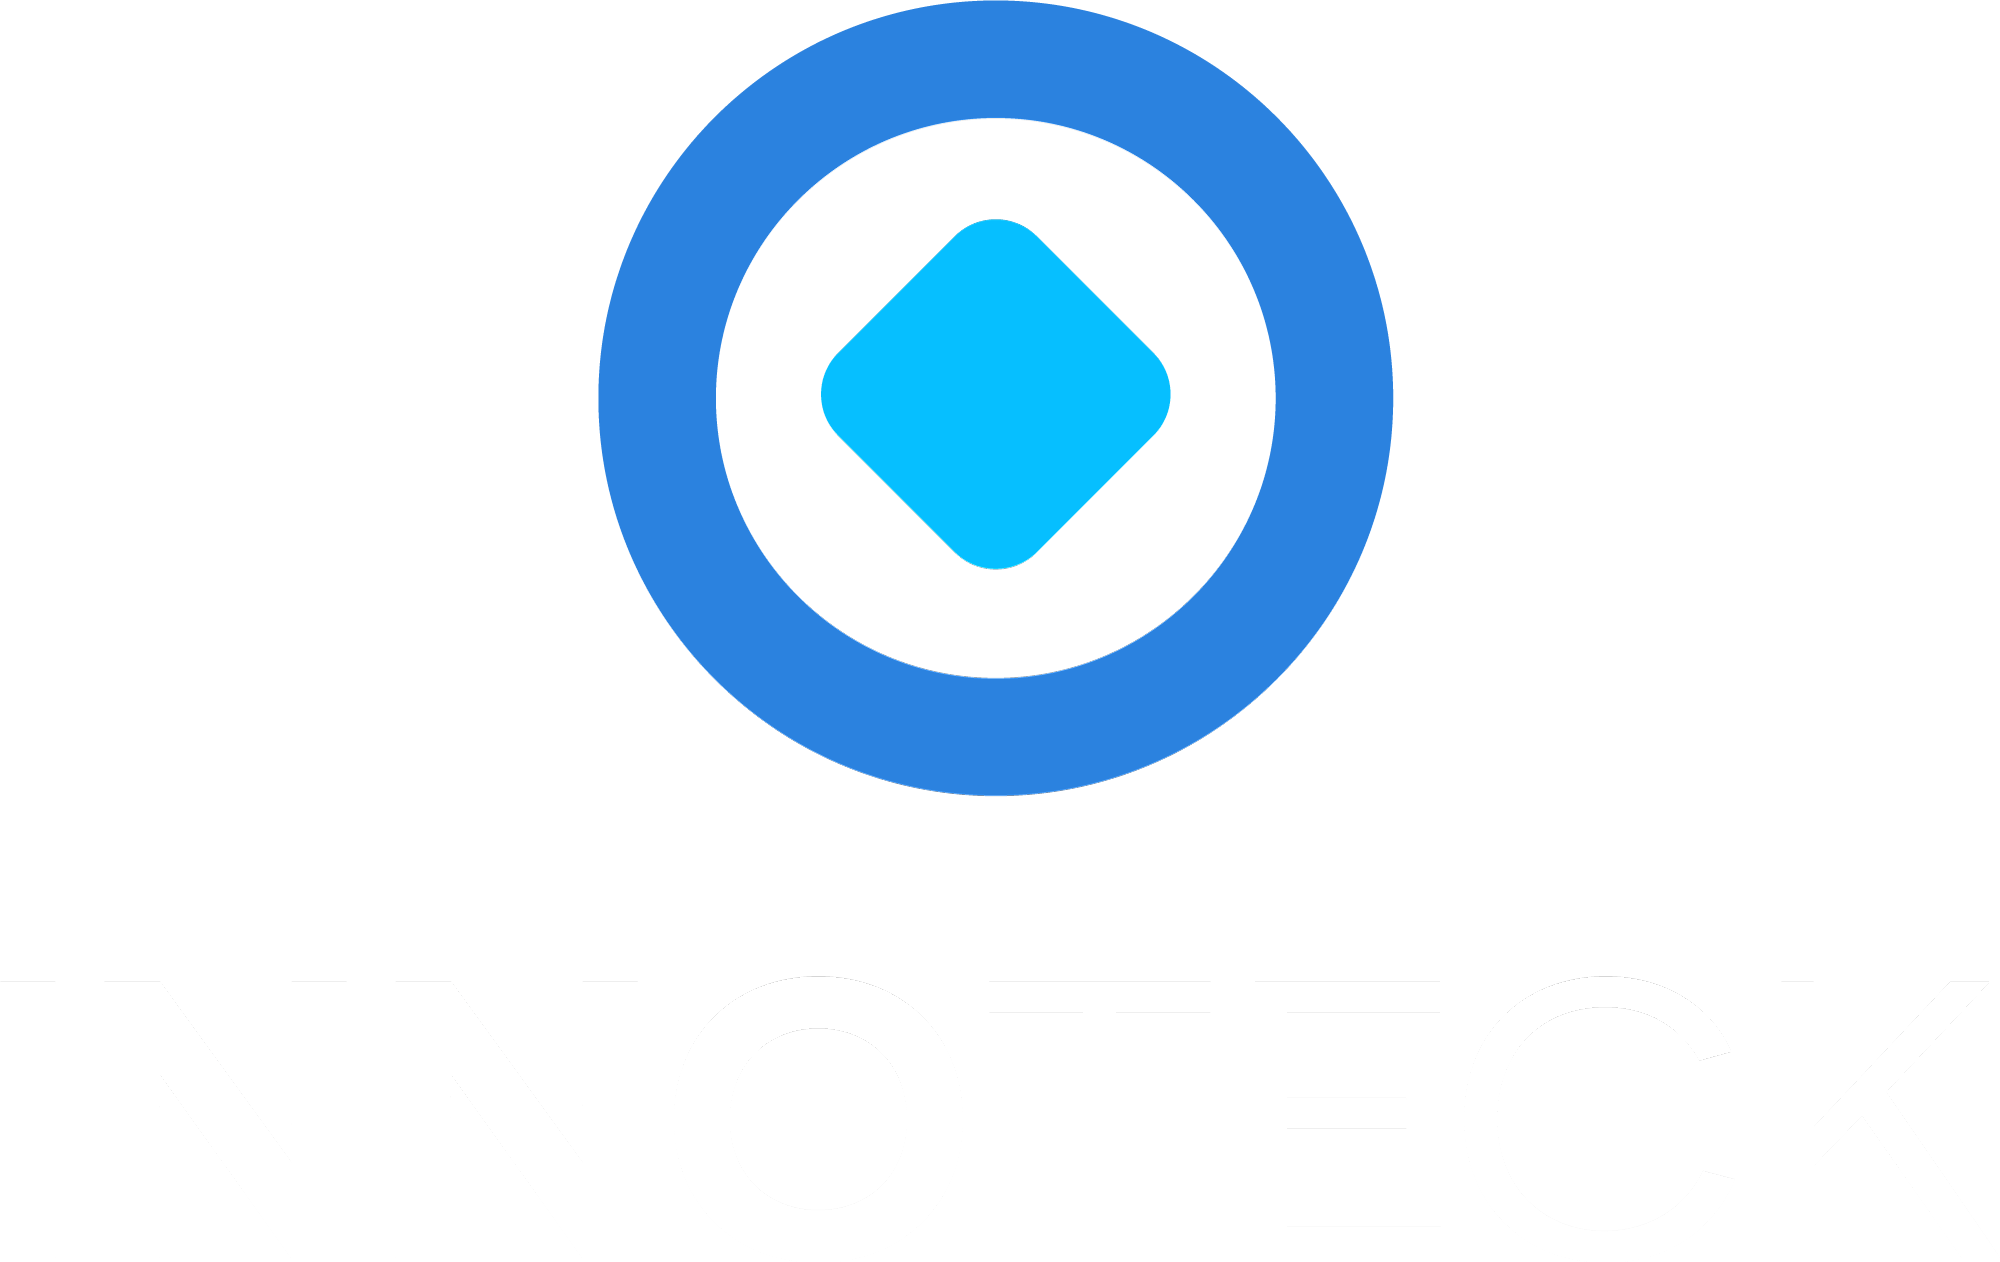 Innoteck Logo vertikal - weiße Schrift